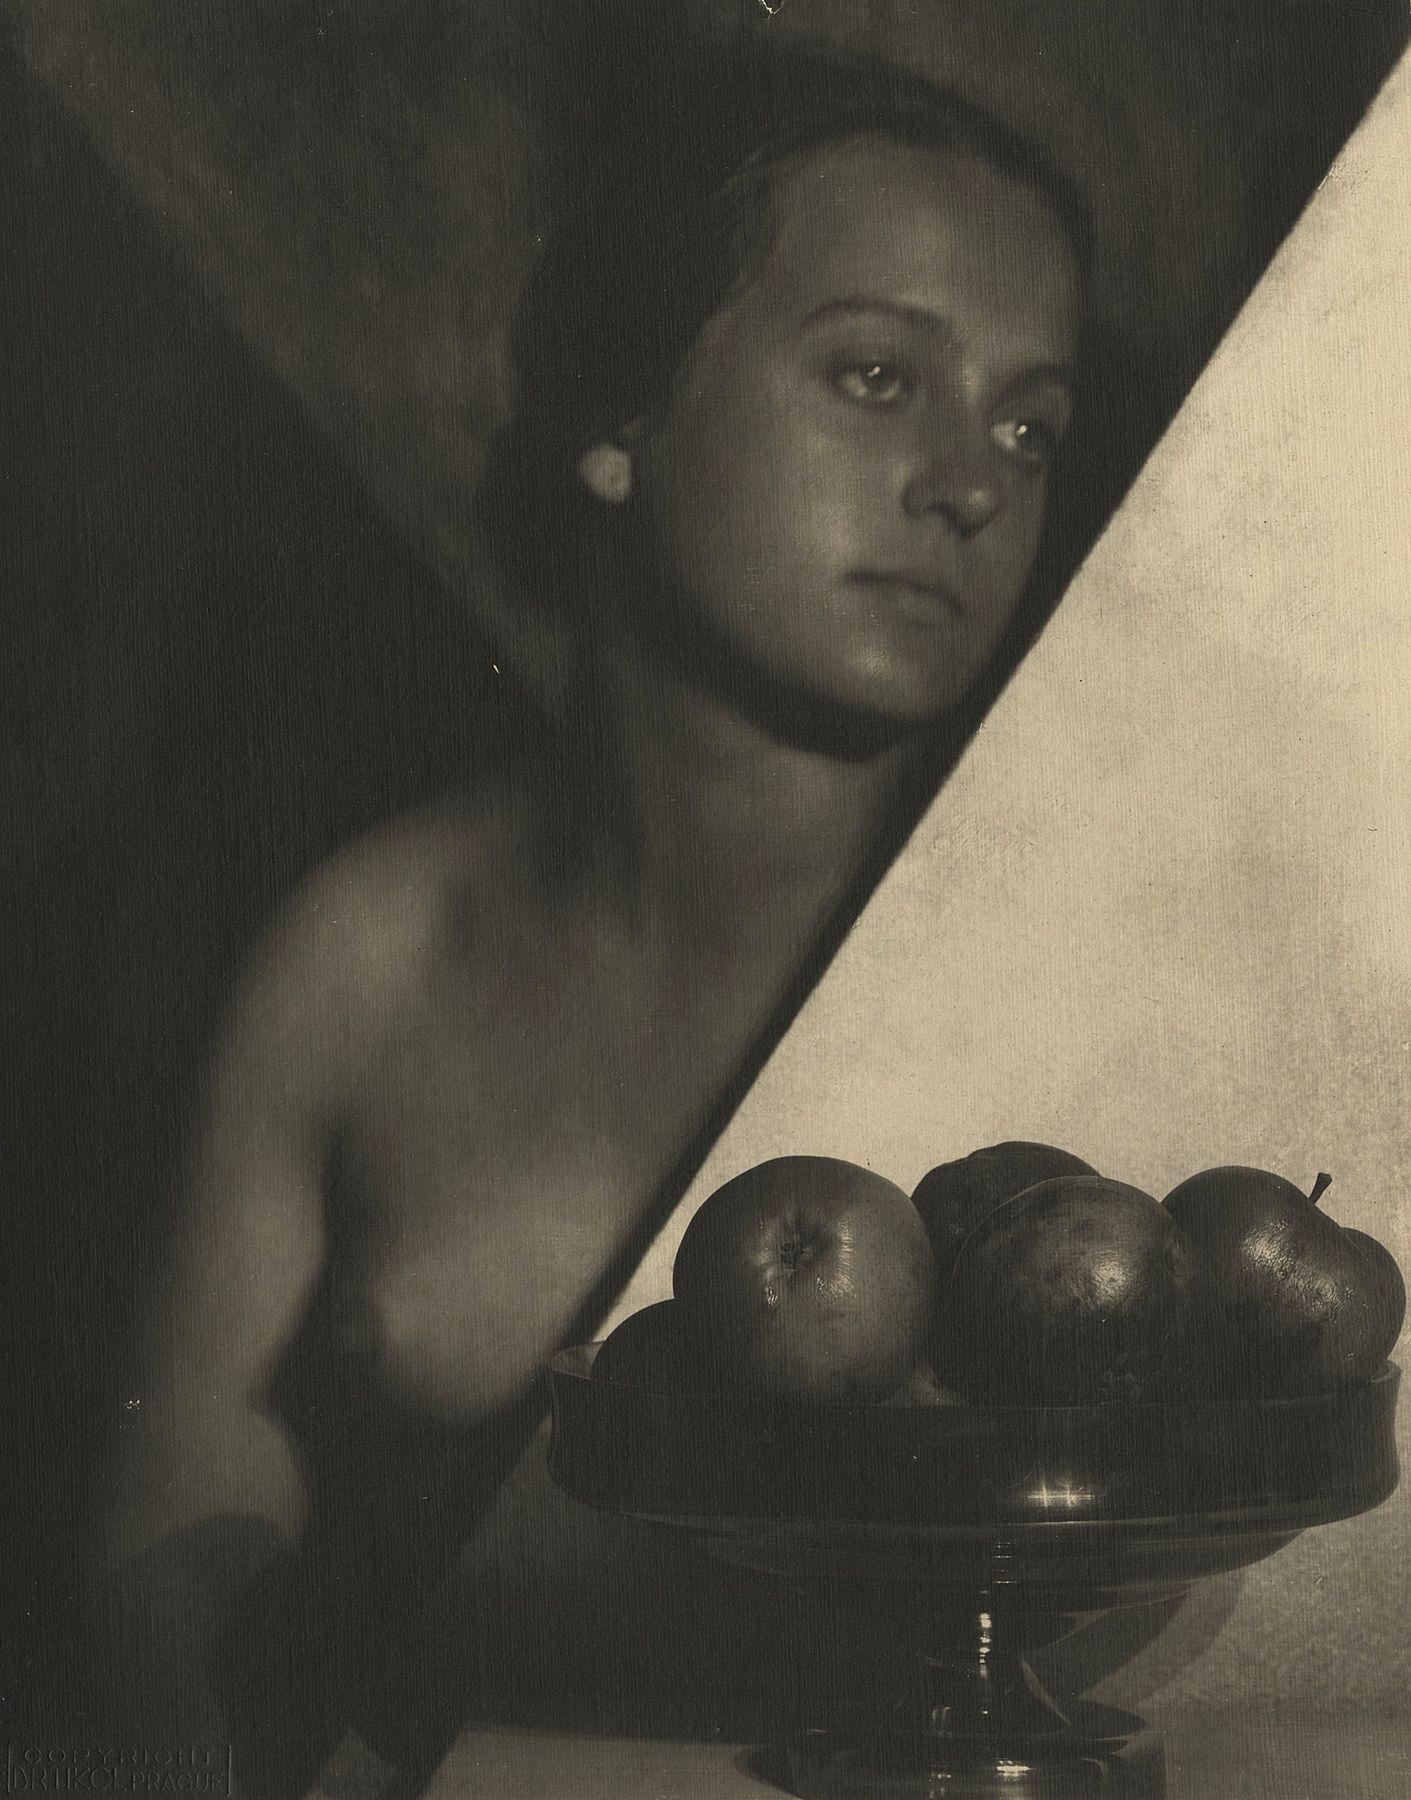 František Drtikol - Untitled, c.1925 - Howard Greenberg Gallery